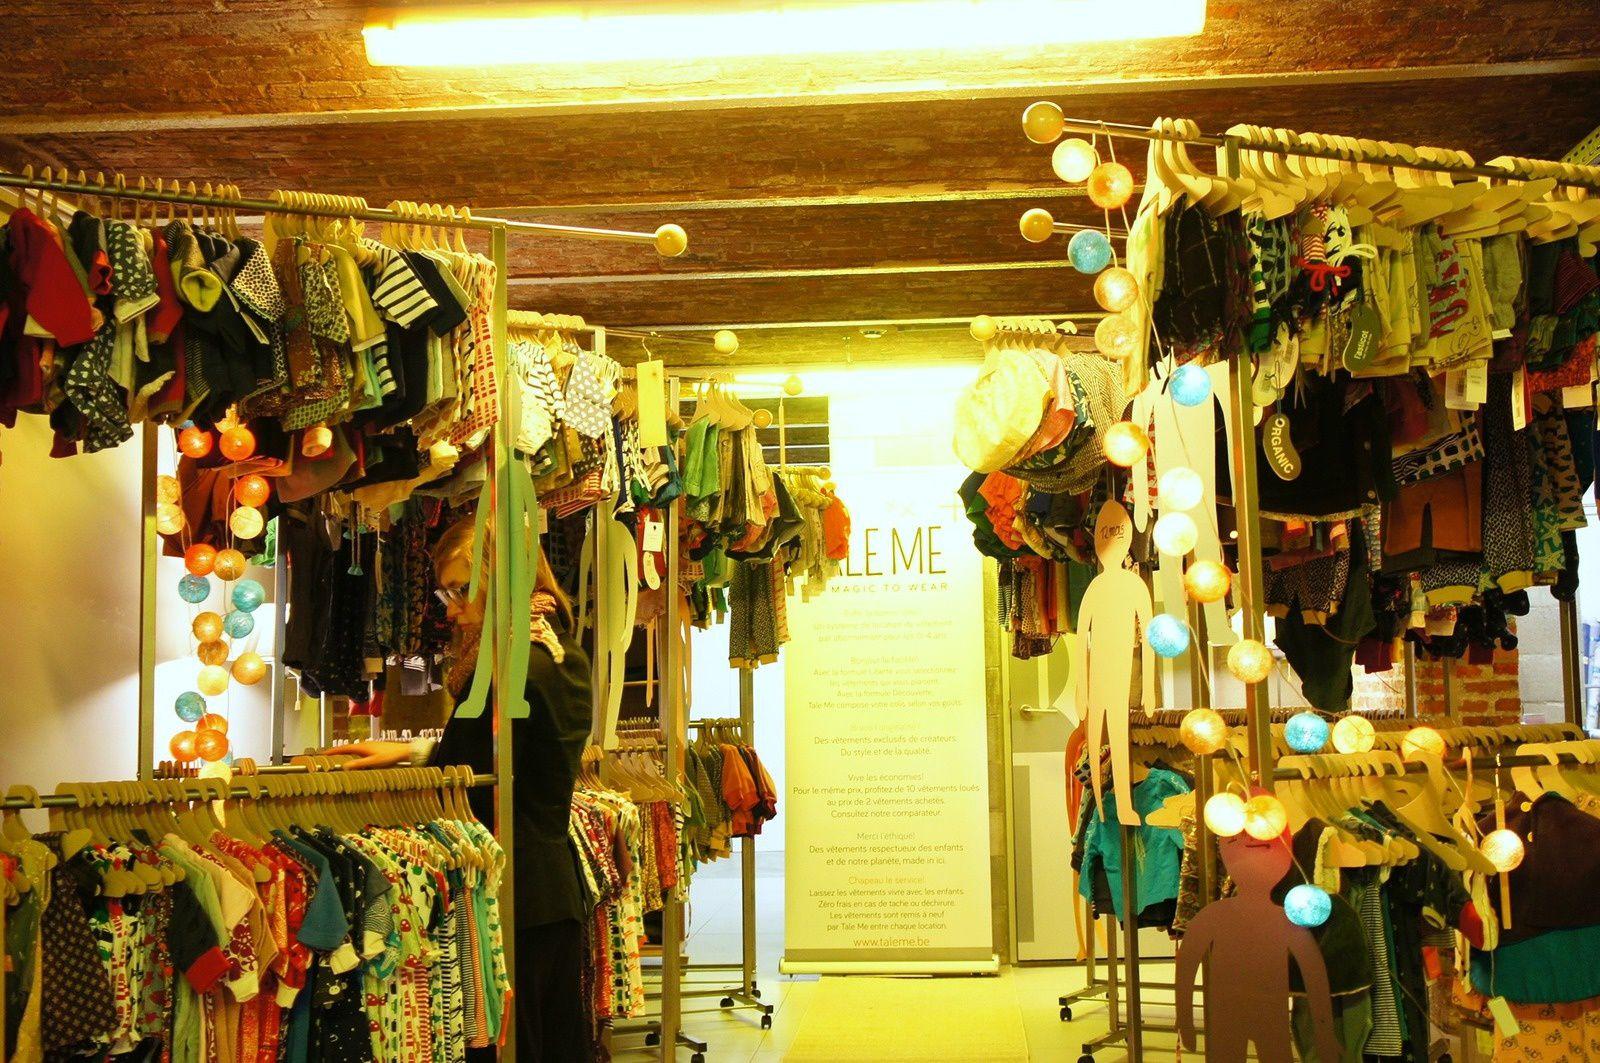 TALE ME // Le showroom!